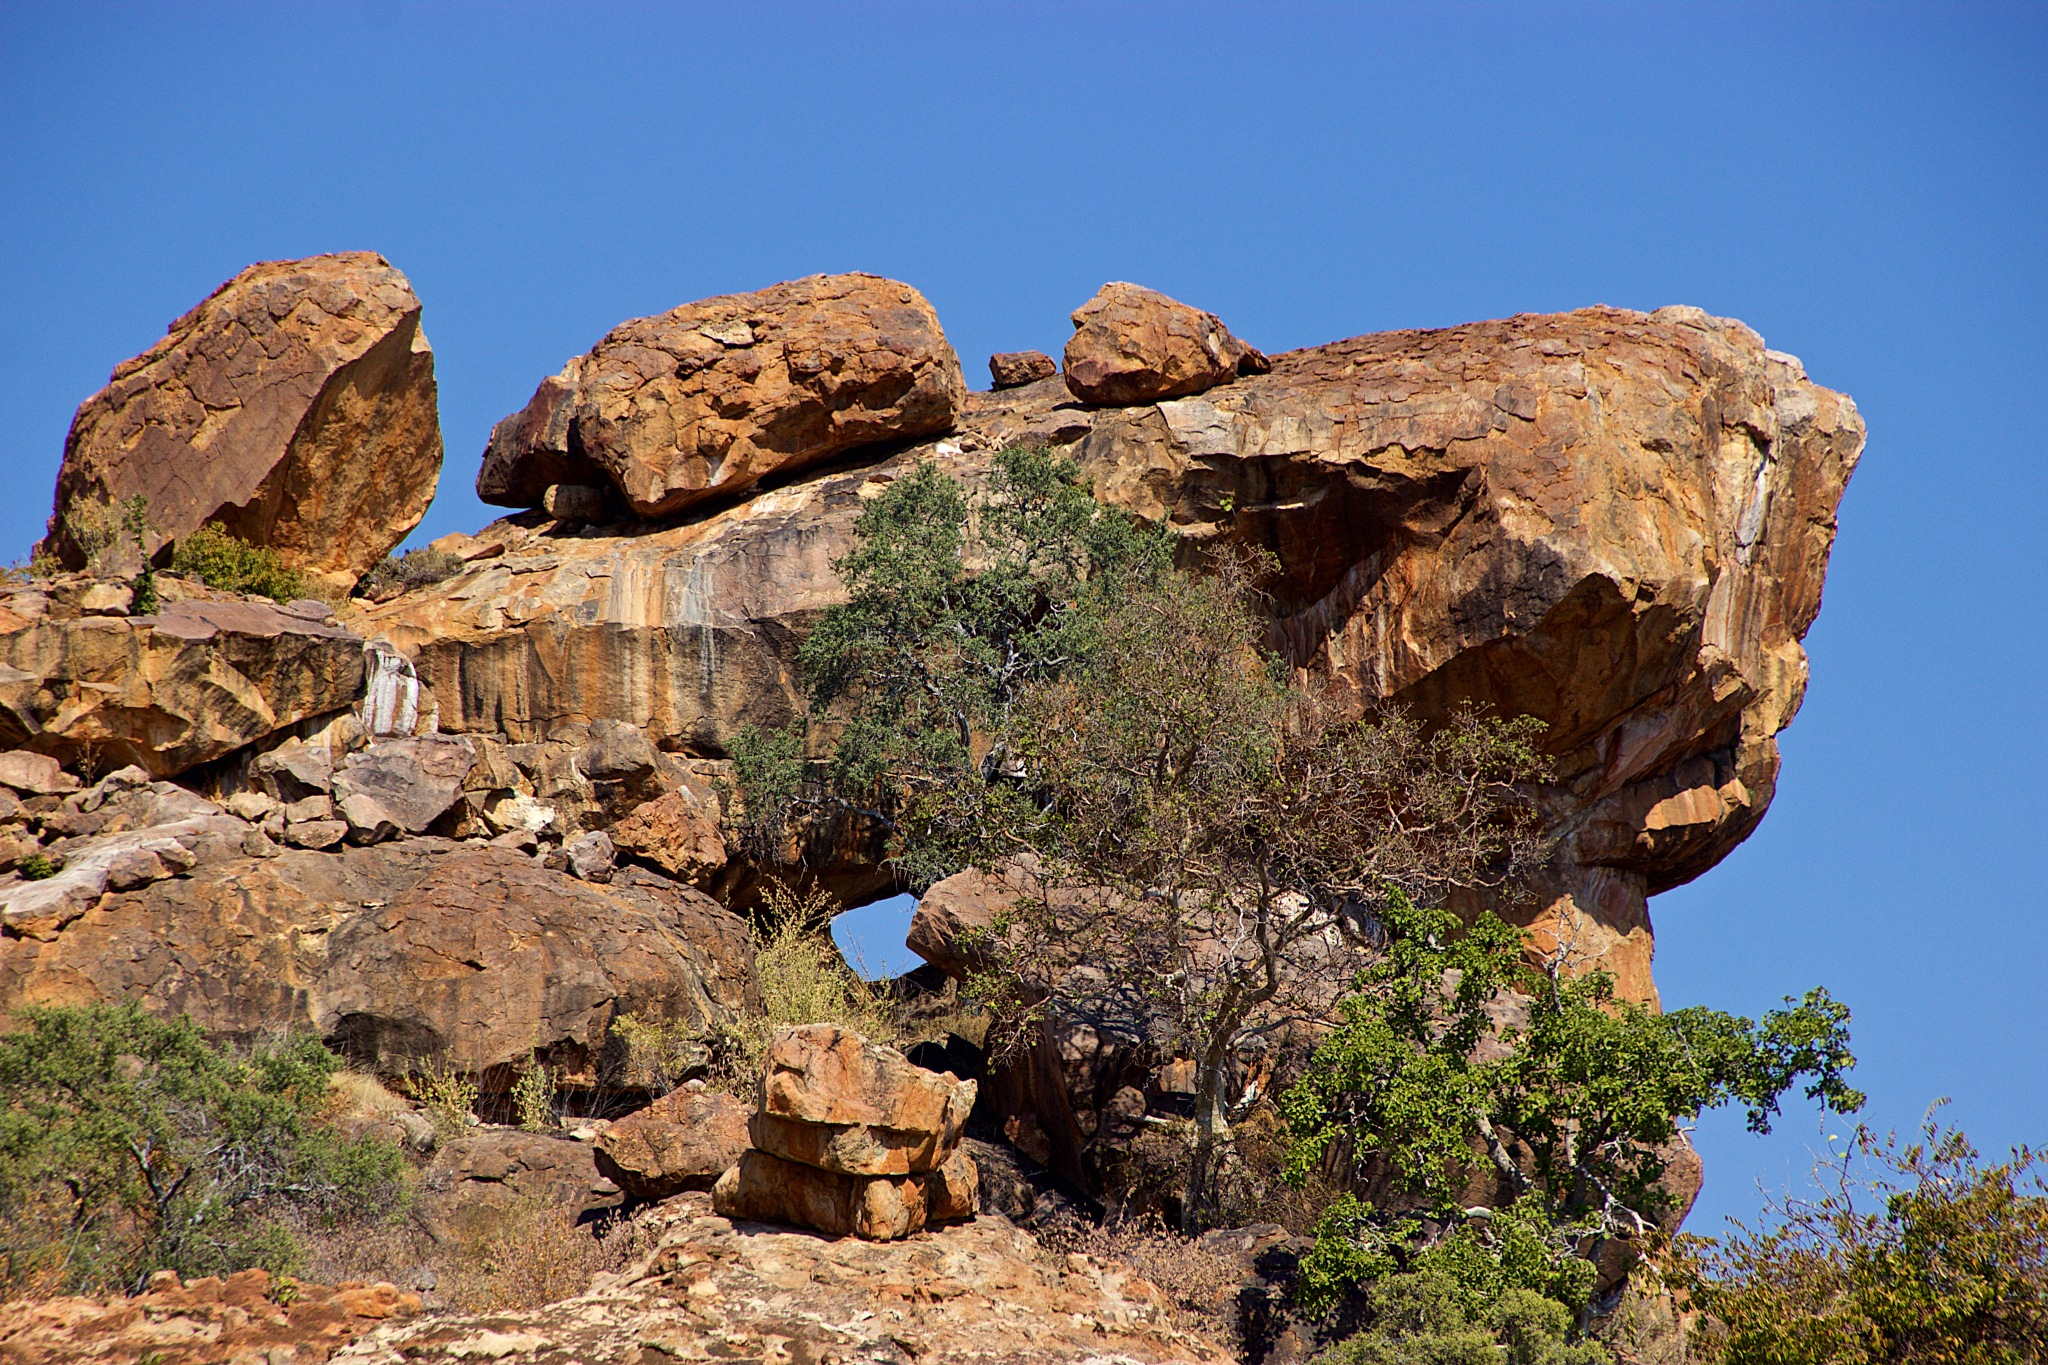 Rock formation by sandybrady